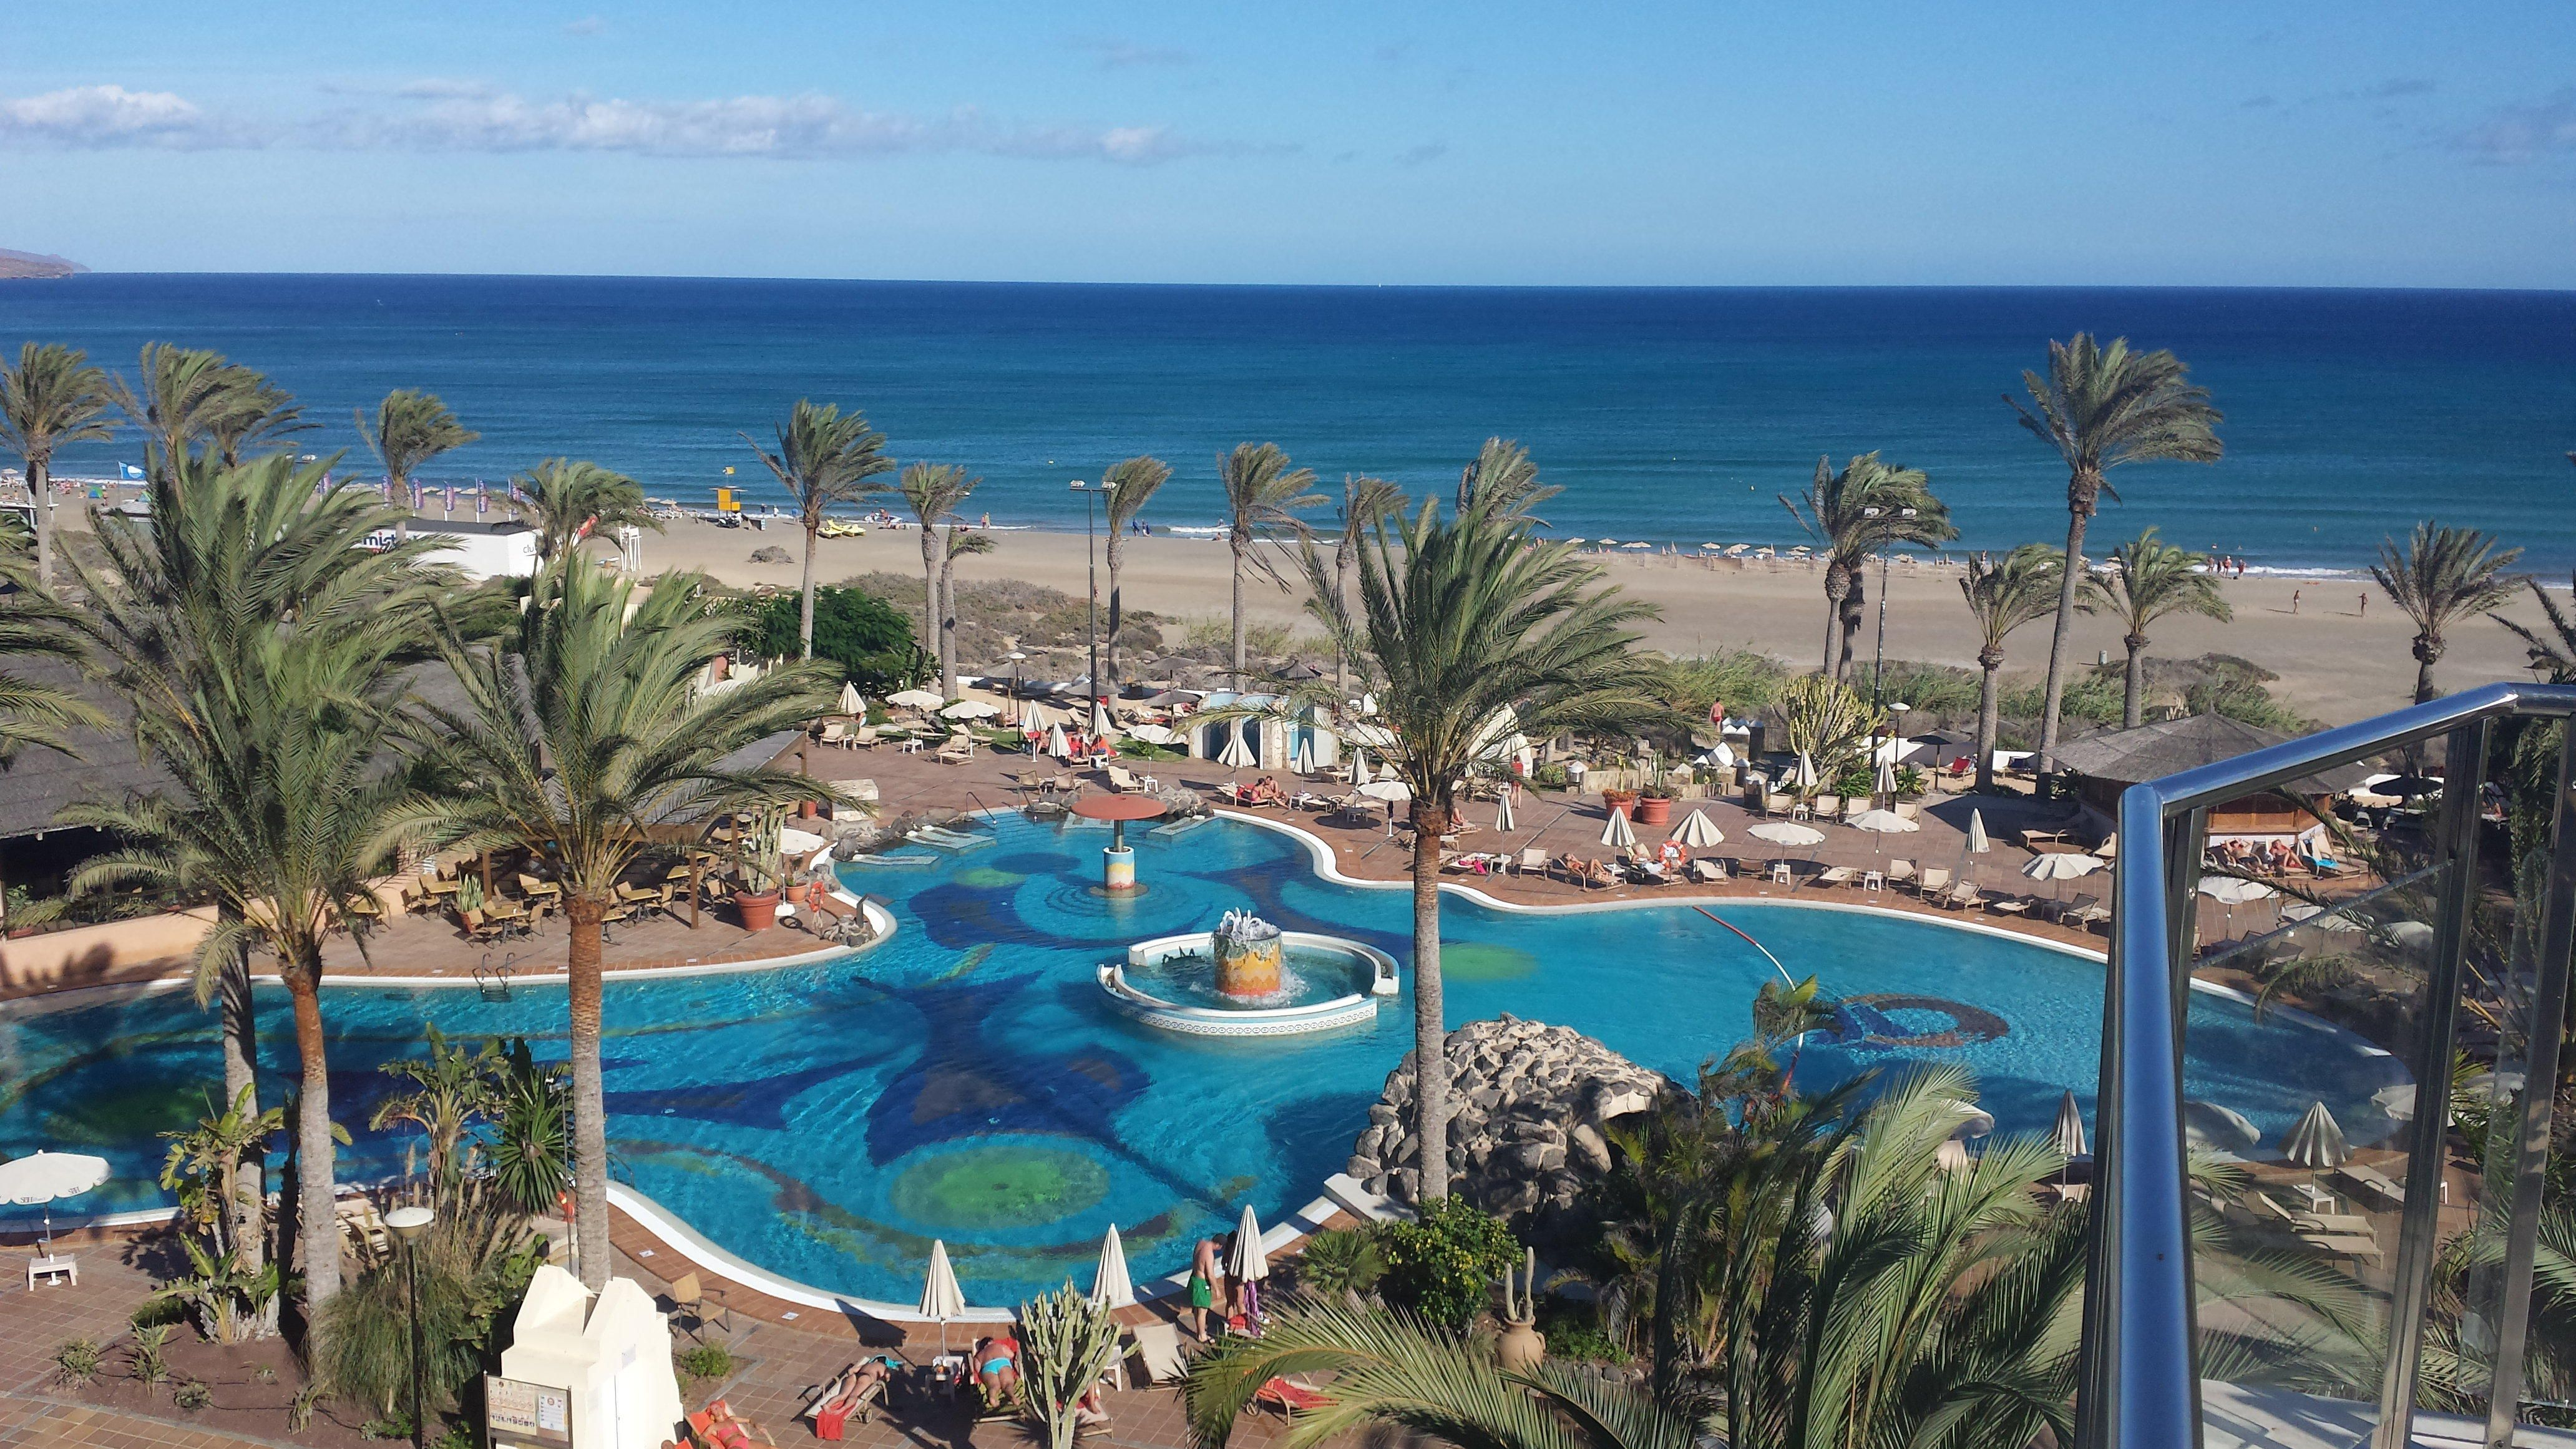 Sbh Hotel Costa Calma Palace In Costa Calma Holidaycheck